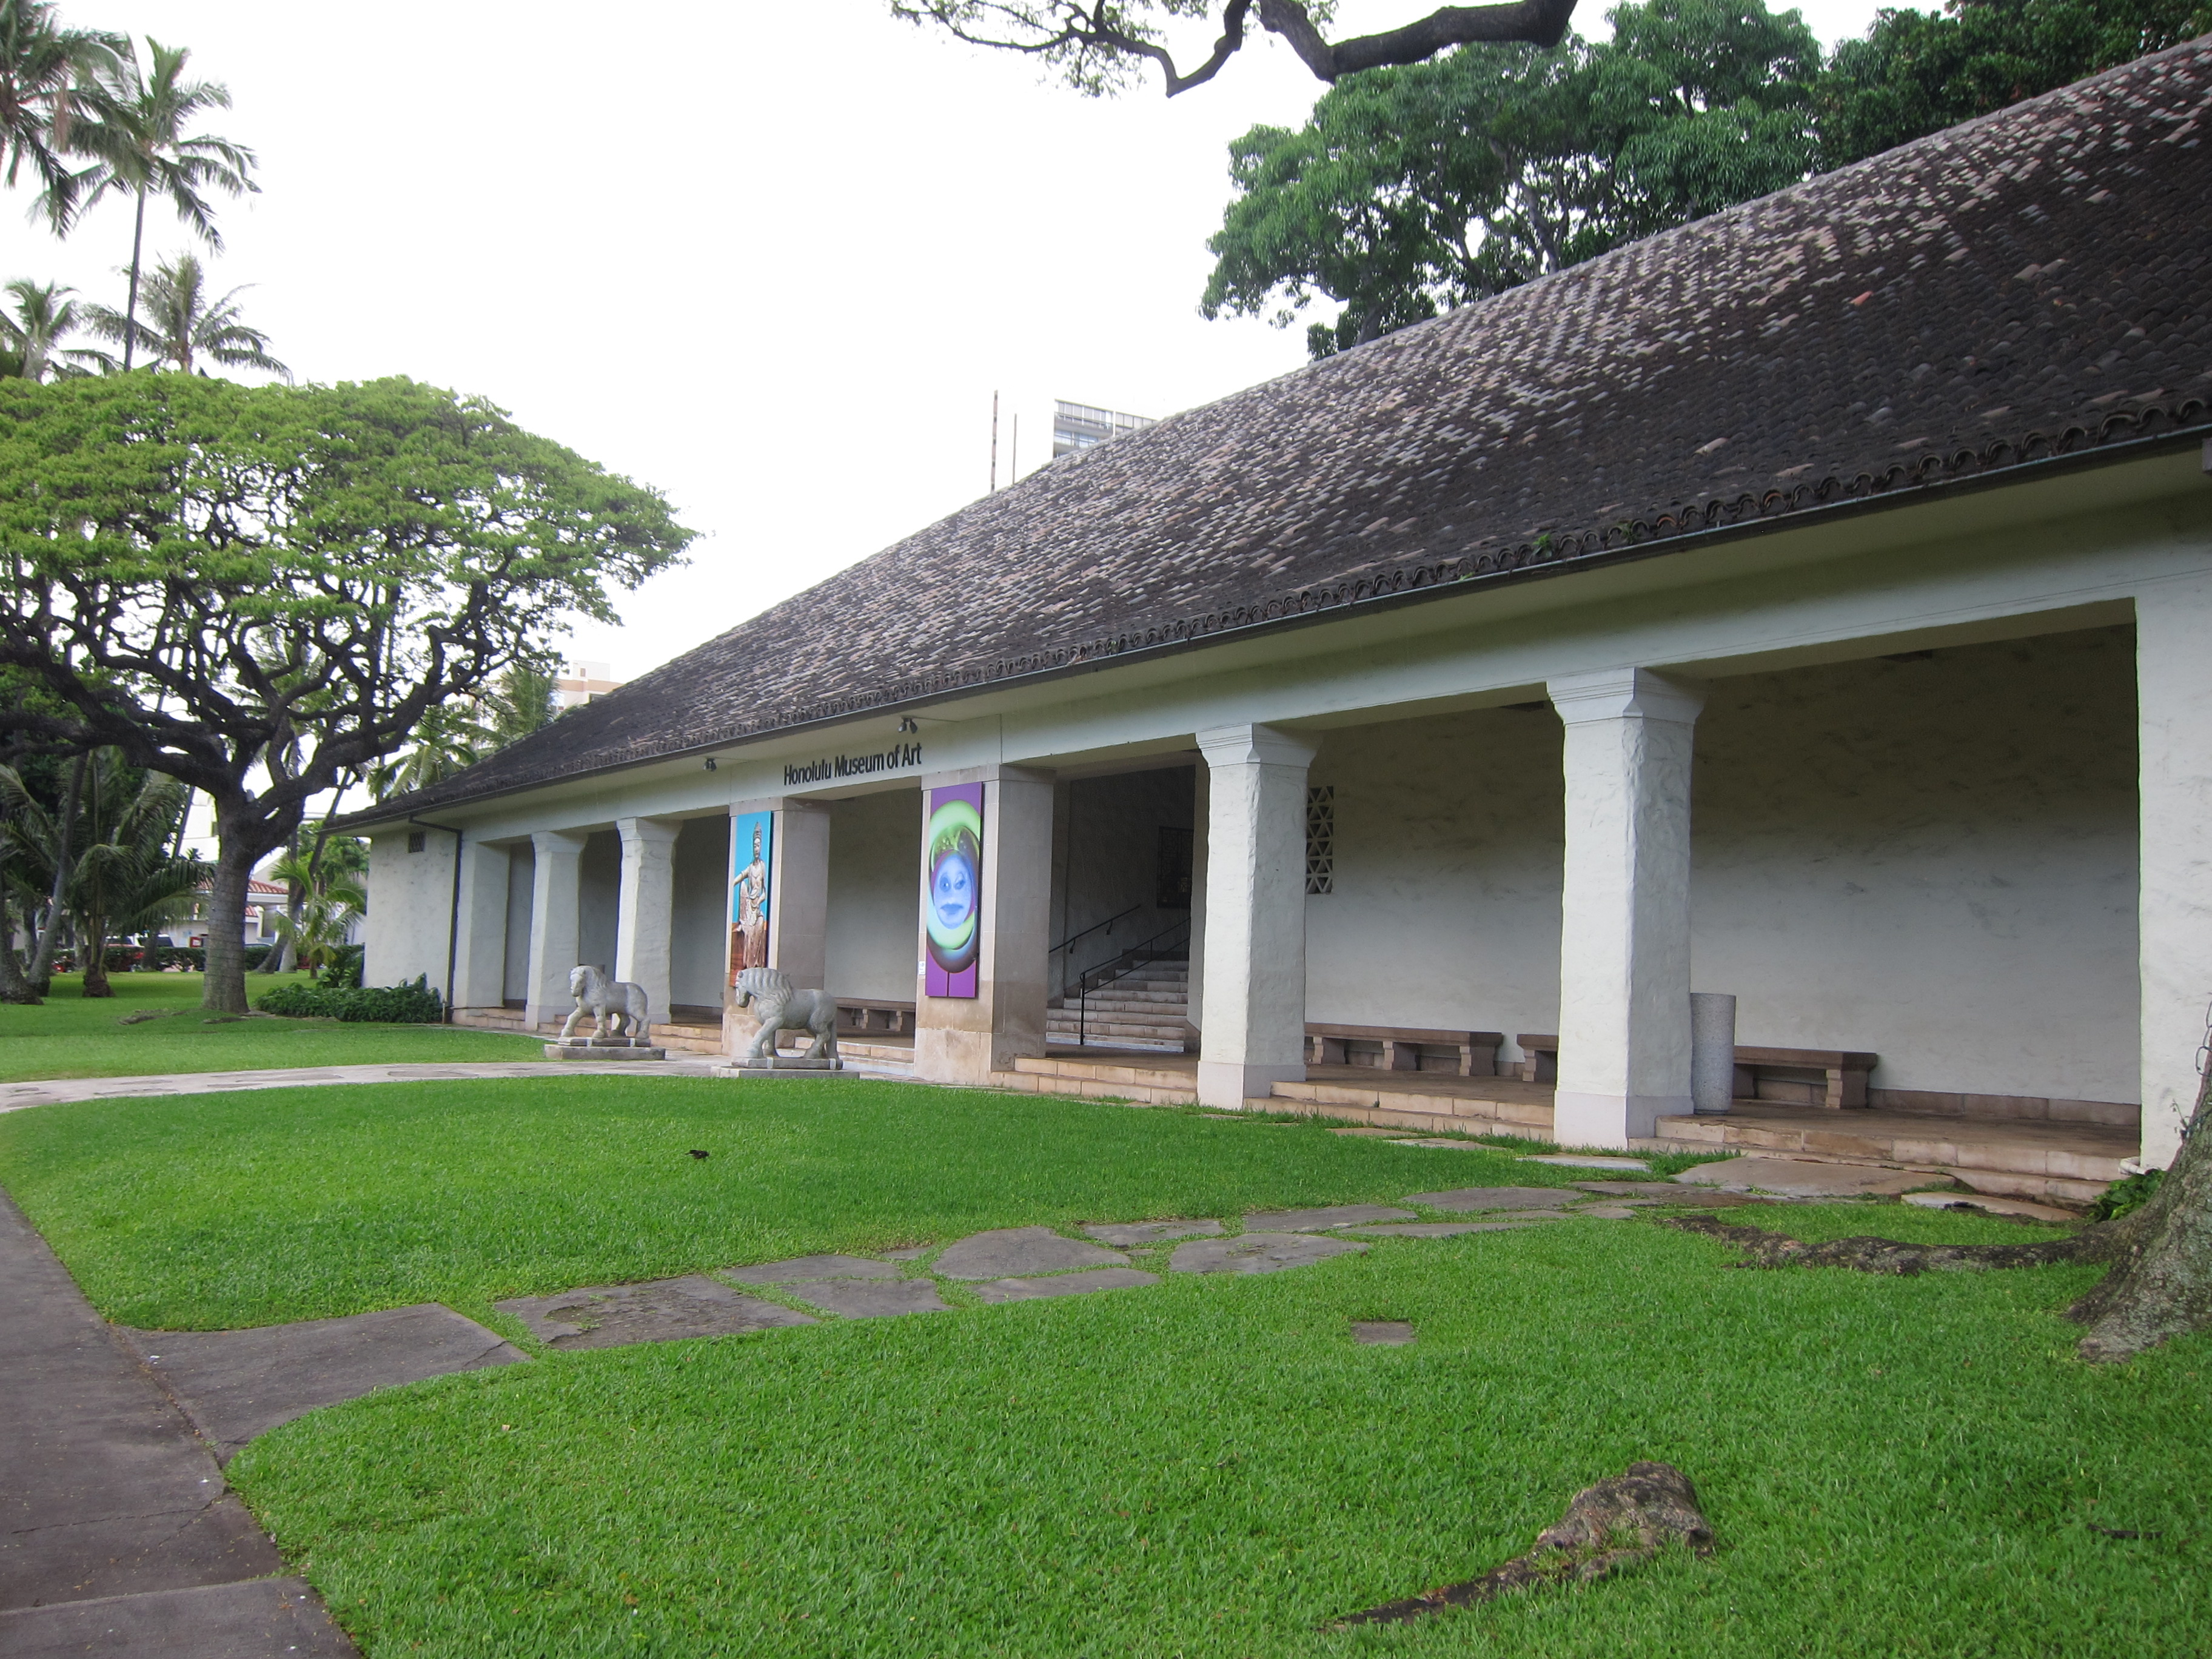 Museum Honolulu Hawaii Honolulu Museum of Art